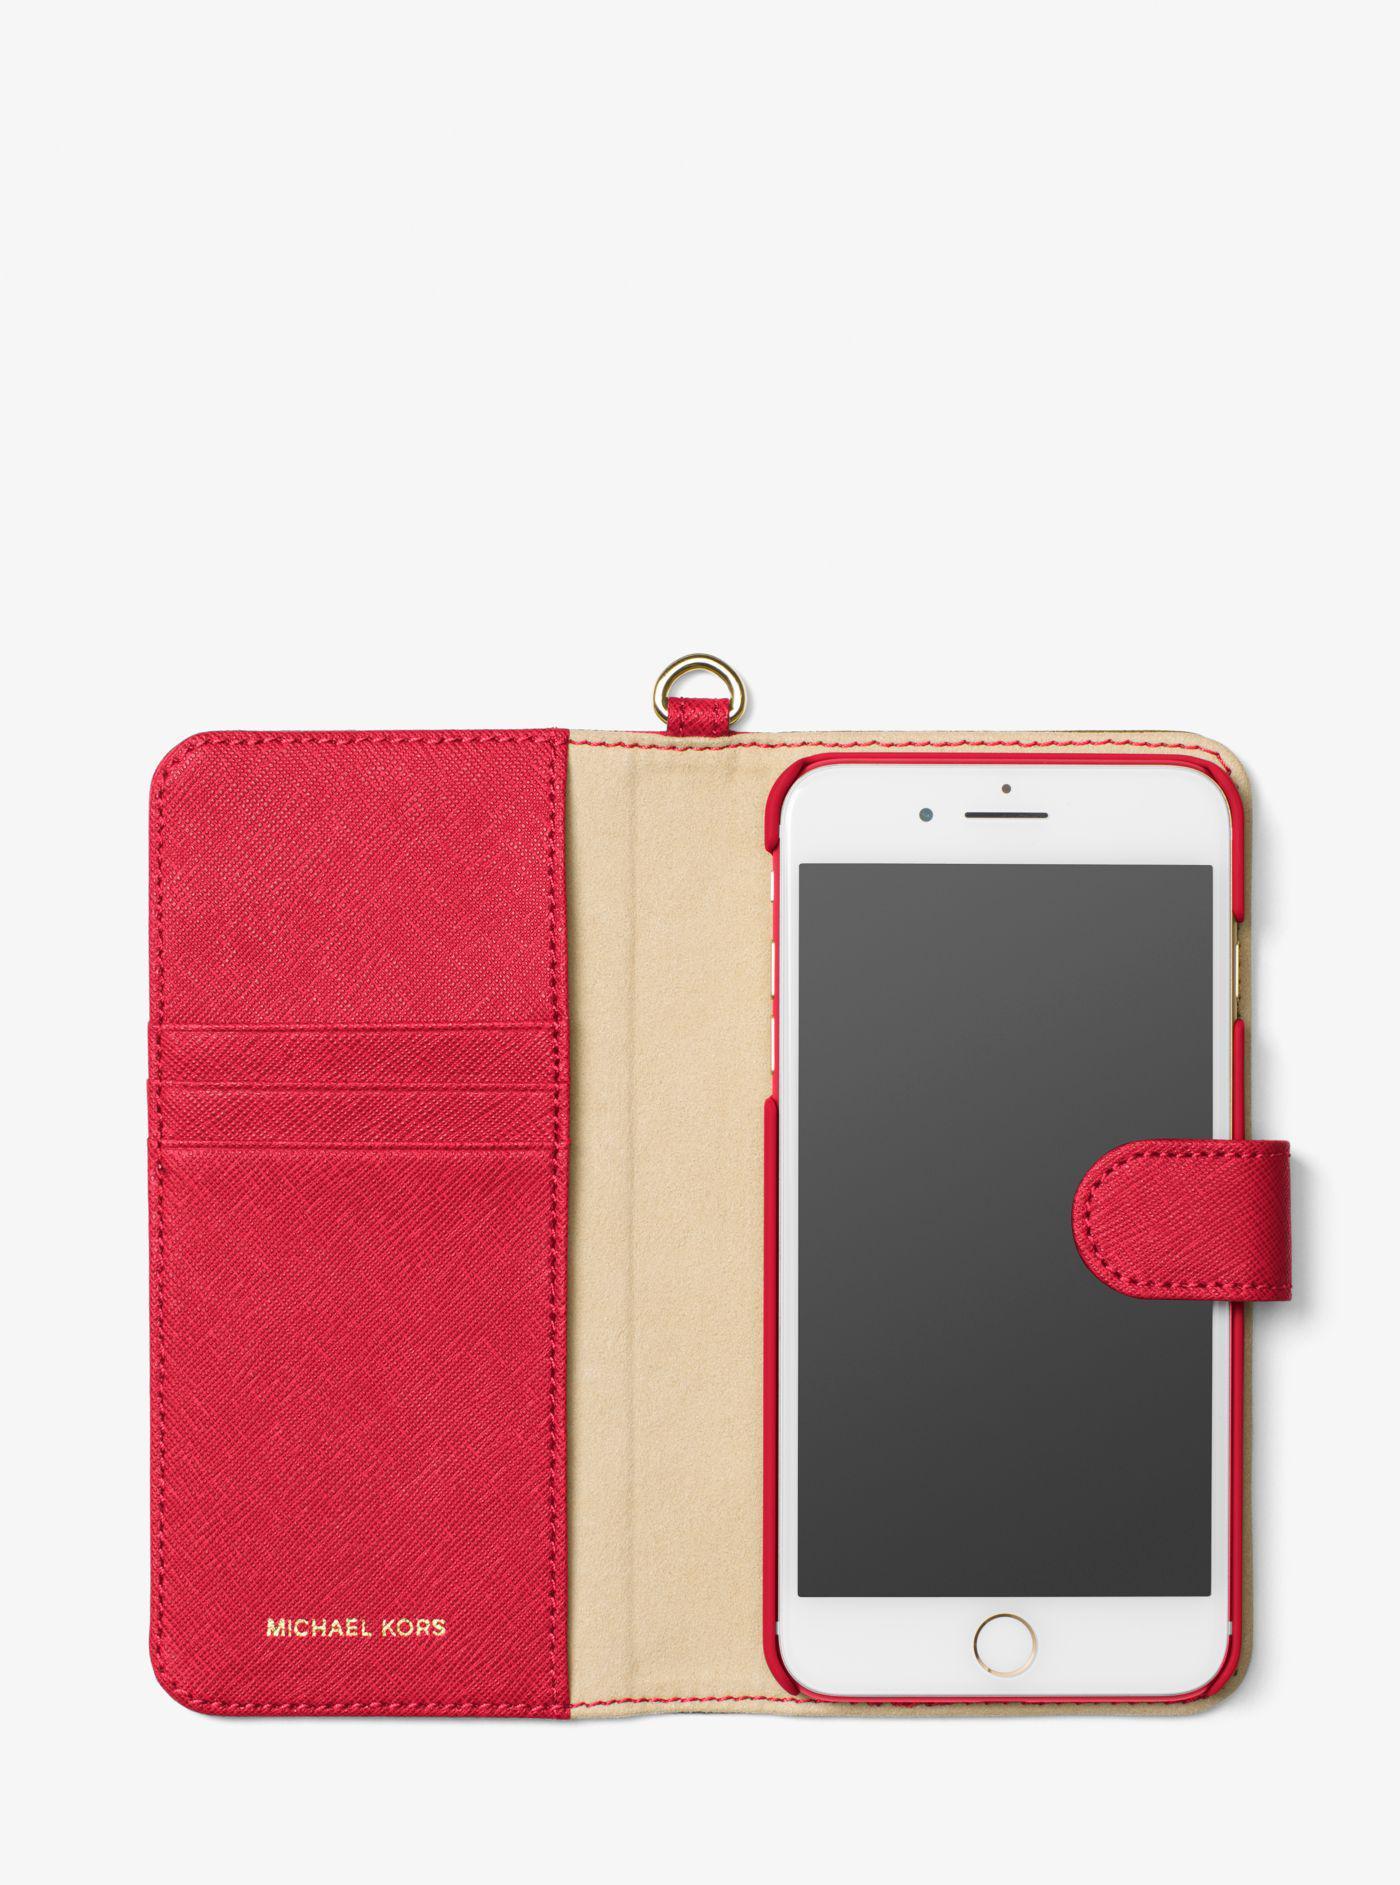 quality design cf1b7 69ea6 Michael Kors Red Saffiano Leather Folio Phone Case For Iphone 7 Plus